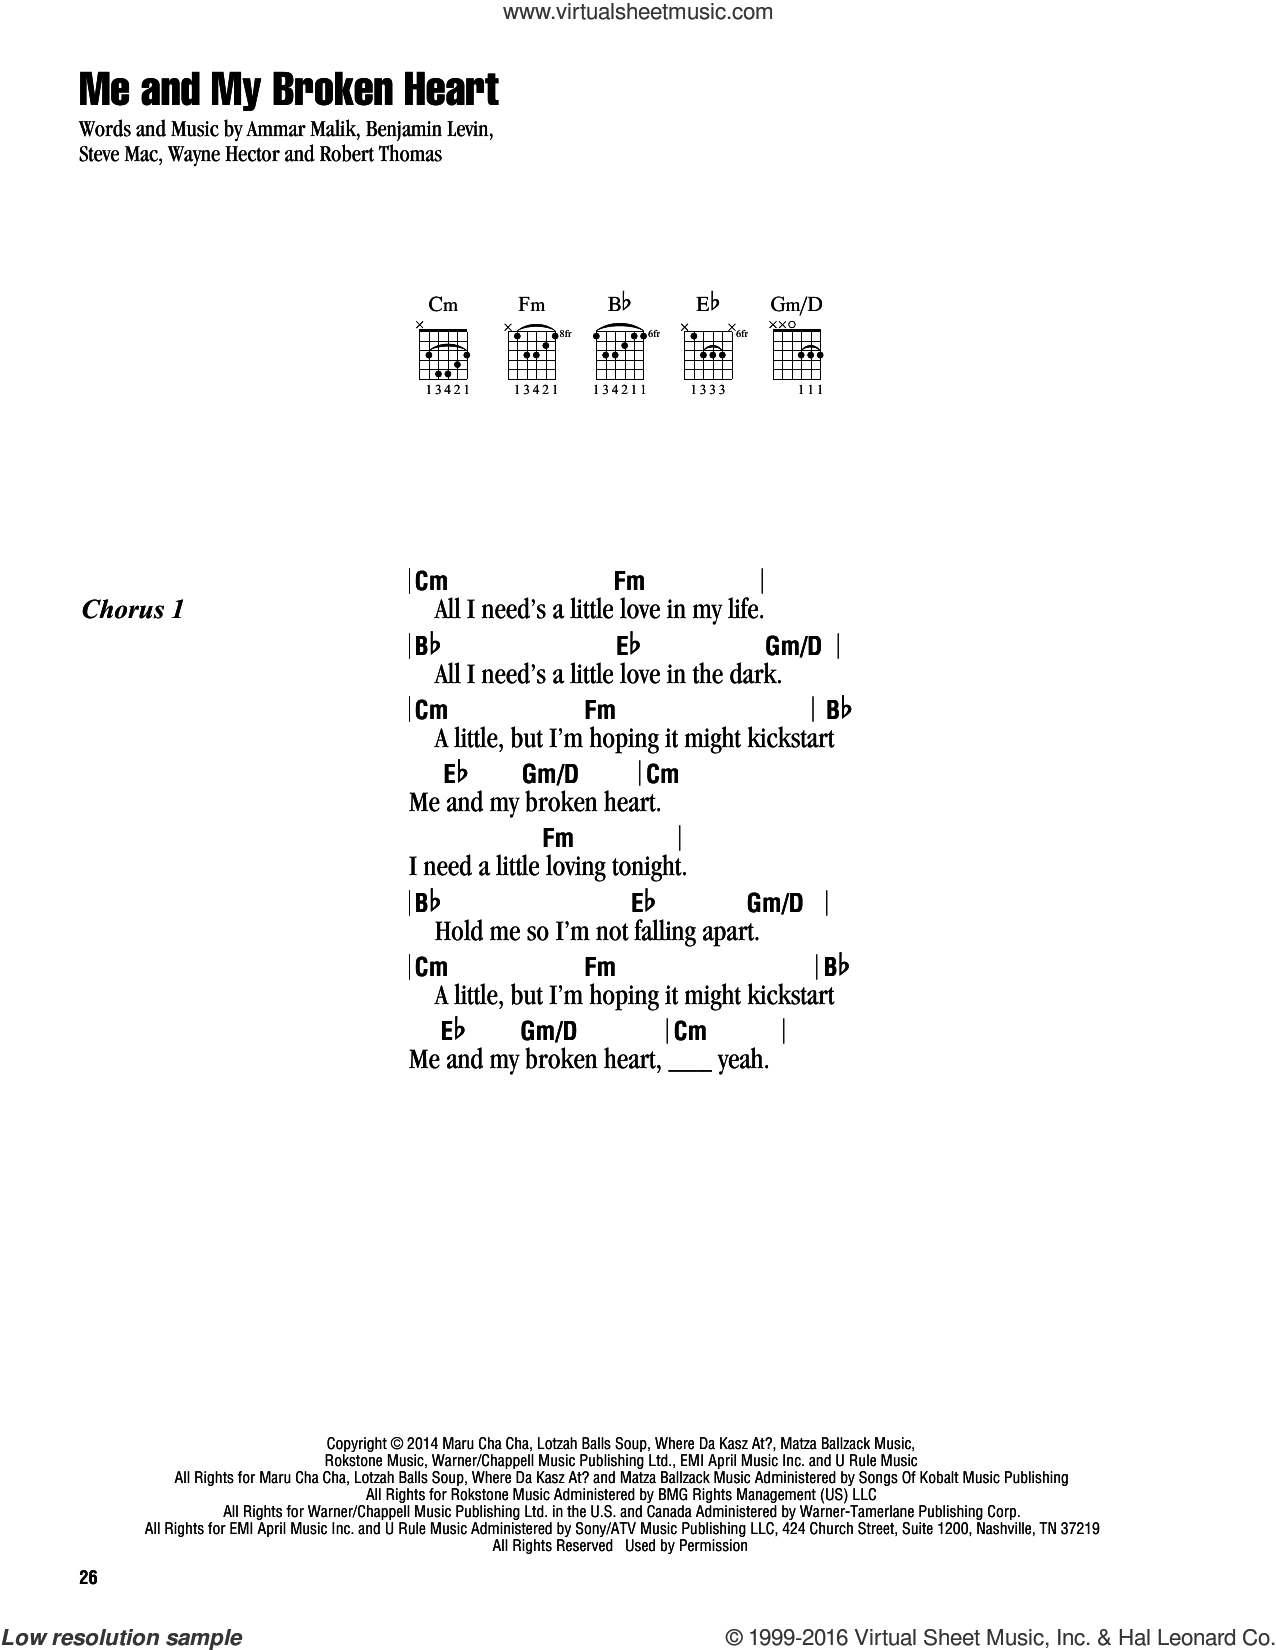 Me And My Broken Heart sheet music for guitar (chords) by Rixton, Ammar Malik, Benjamin Levin, Robert Thomas, Steve Mac and Wayne Hector, intermediate skill level